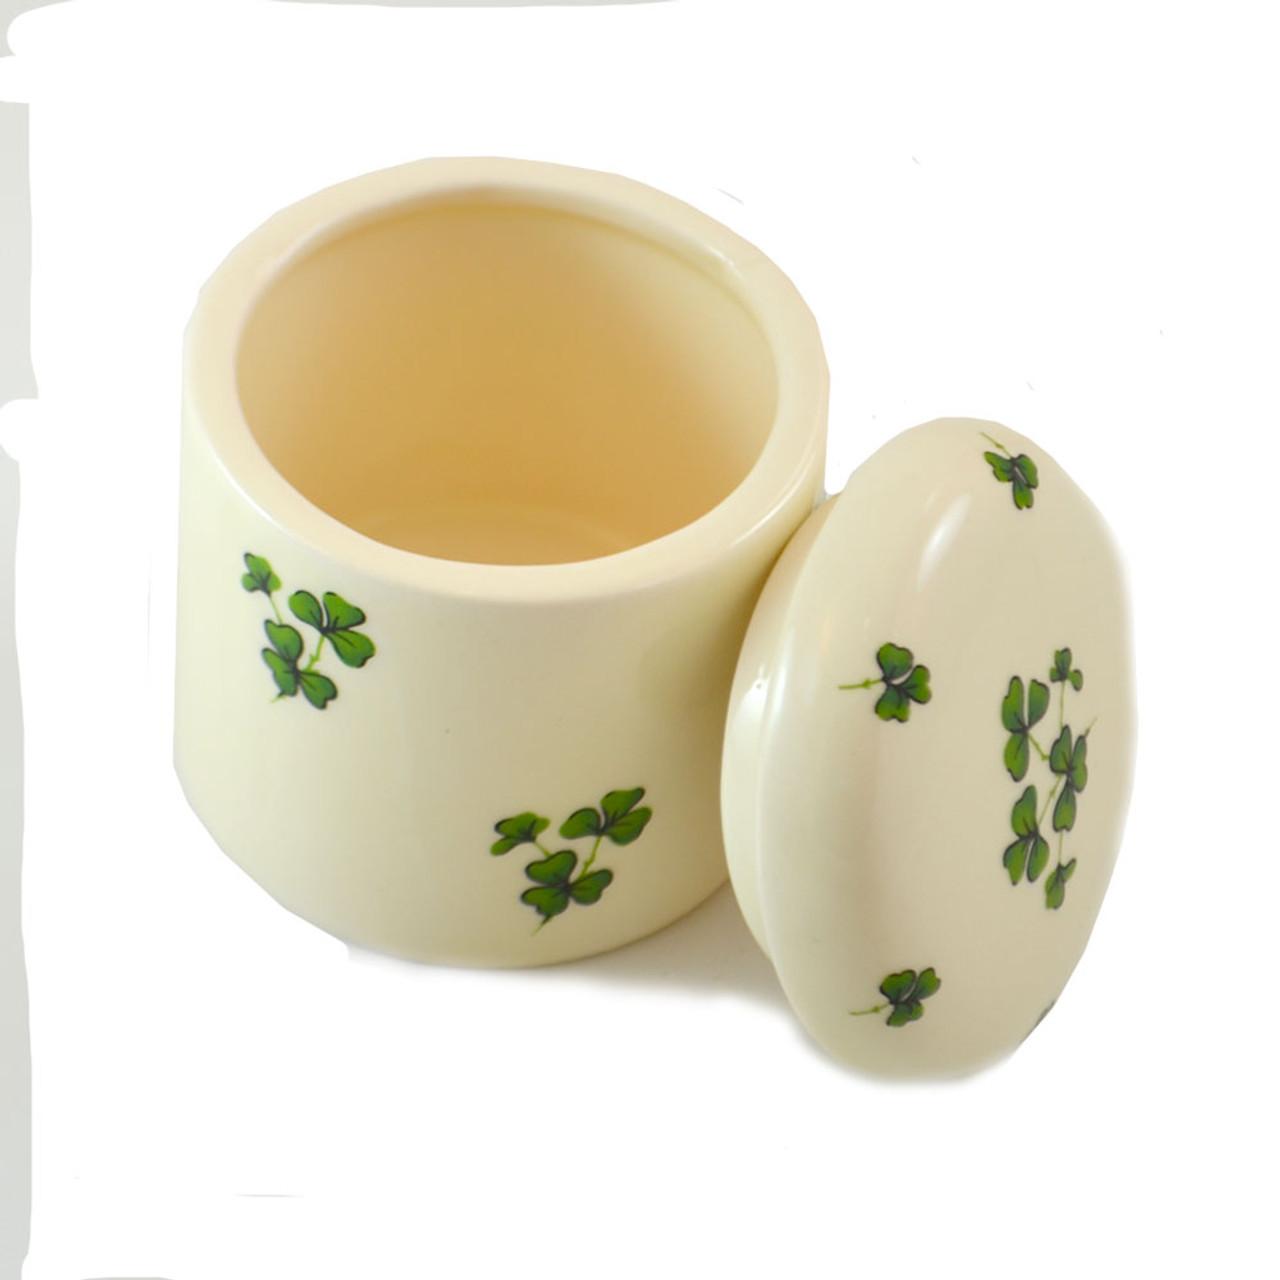 Shamrock Porcelain Trinket Box